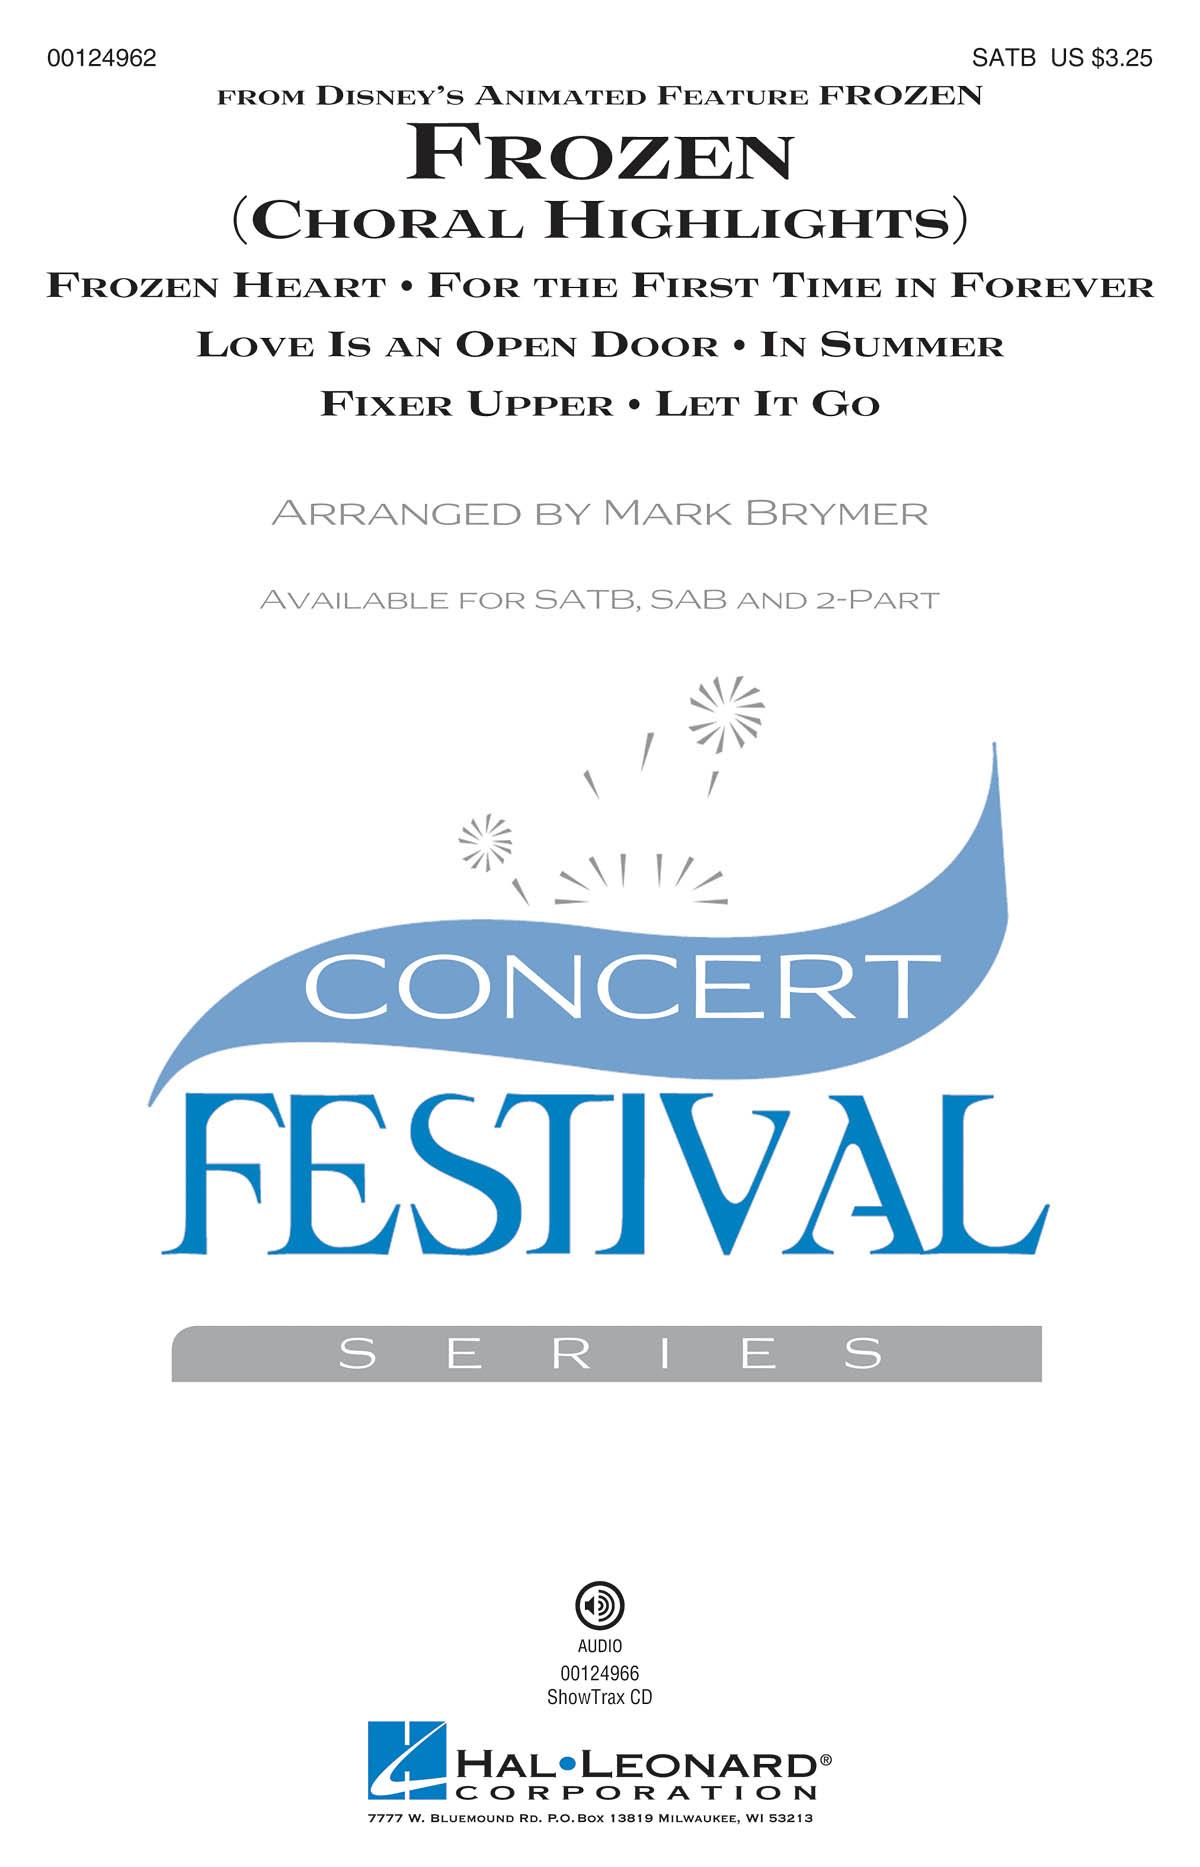 Frozen (Choral Highlights): Mixed Choir a Cappella: Vocal Score